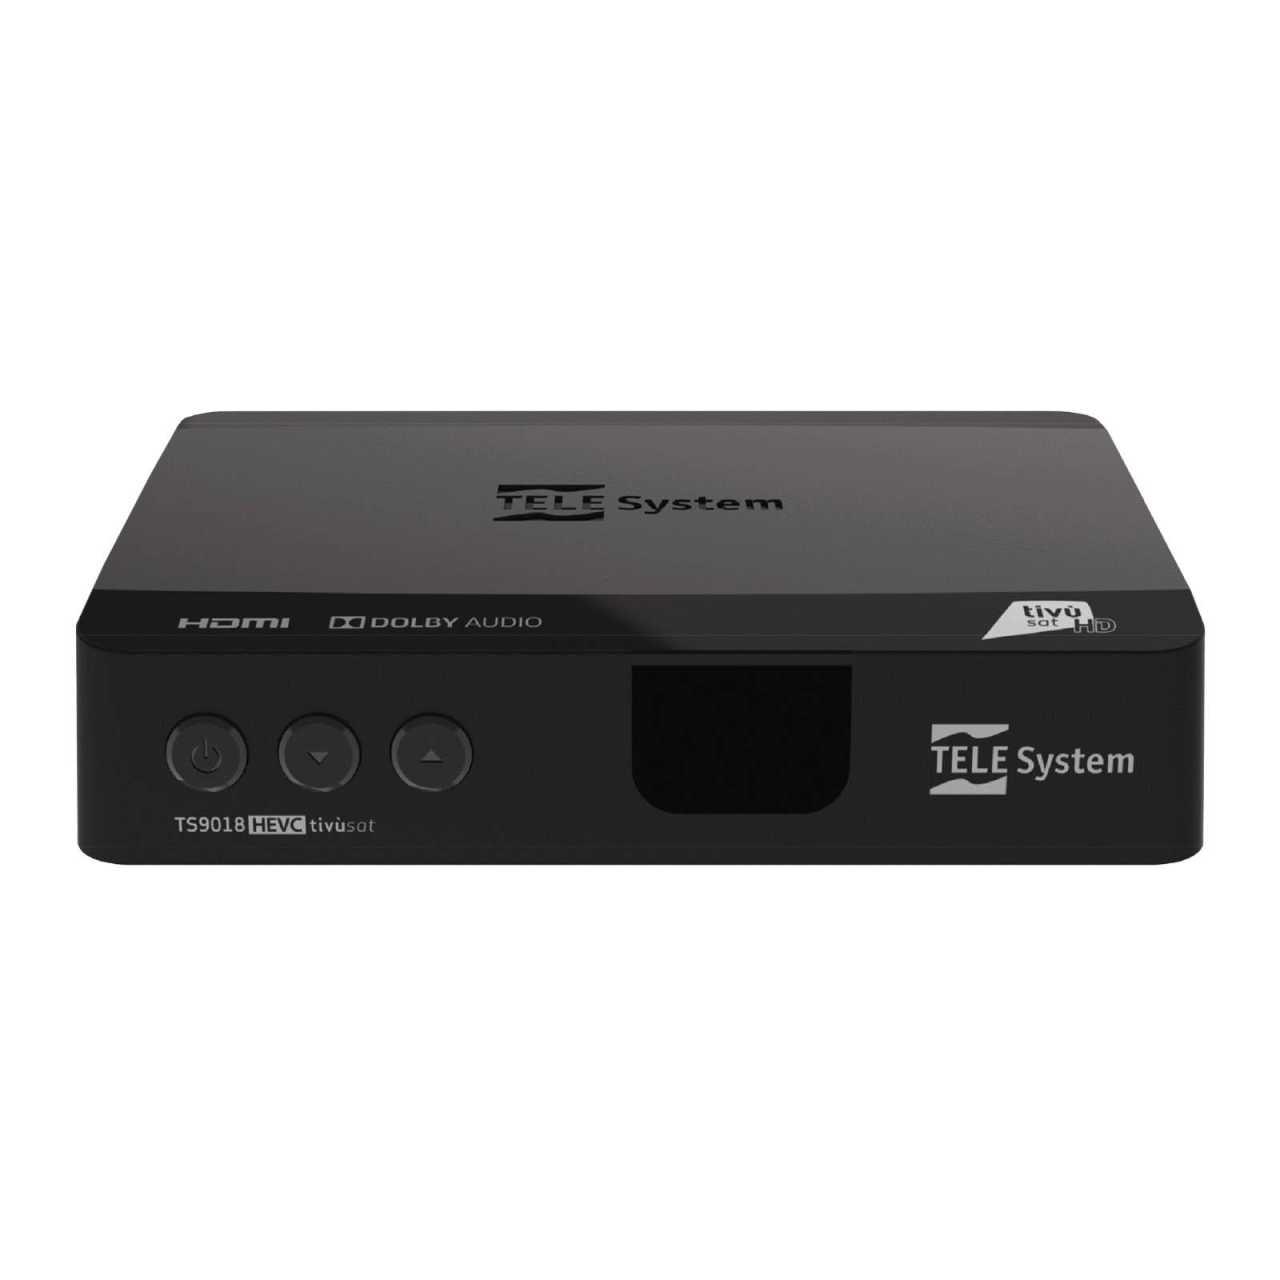 Telesystem TS9018 Full HD HEVC H.265 Smartcard HDMI DVB-S2 Sat Receiver mit Tivusat HD Karte RECTIV018